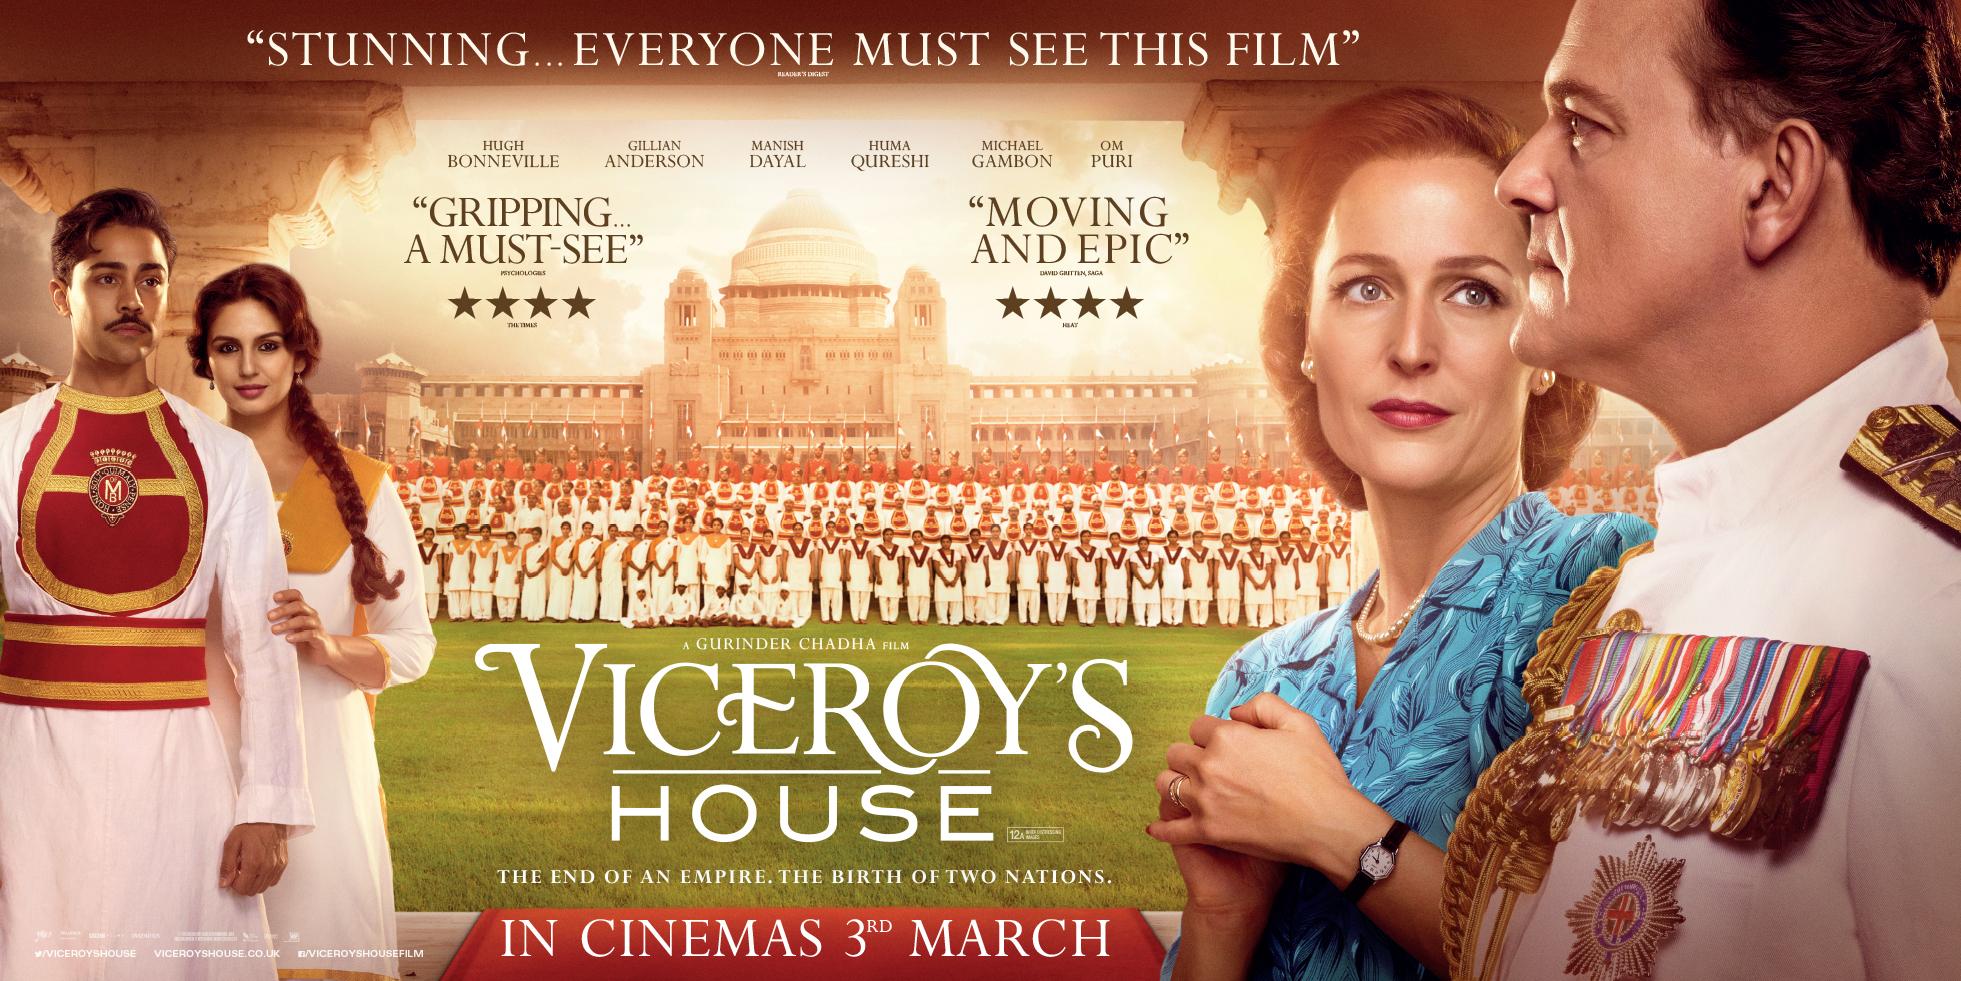 viceroys_house_image.jpg